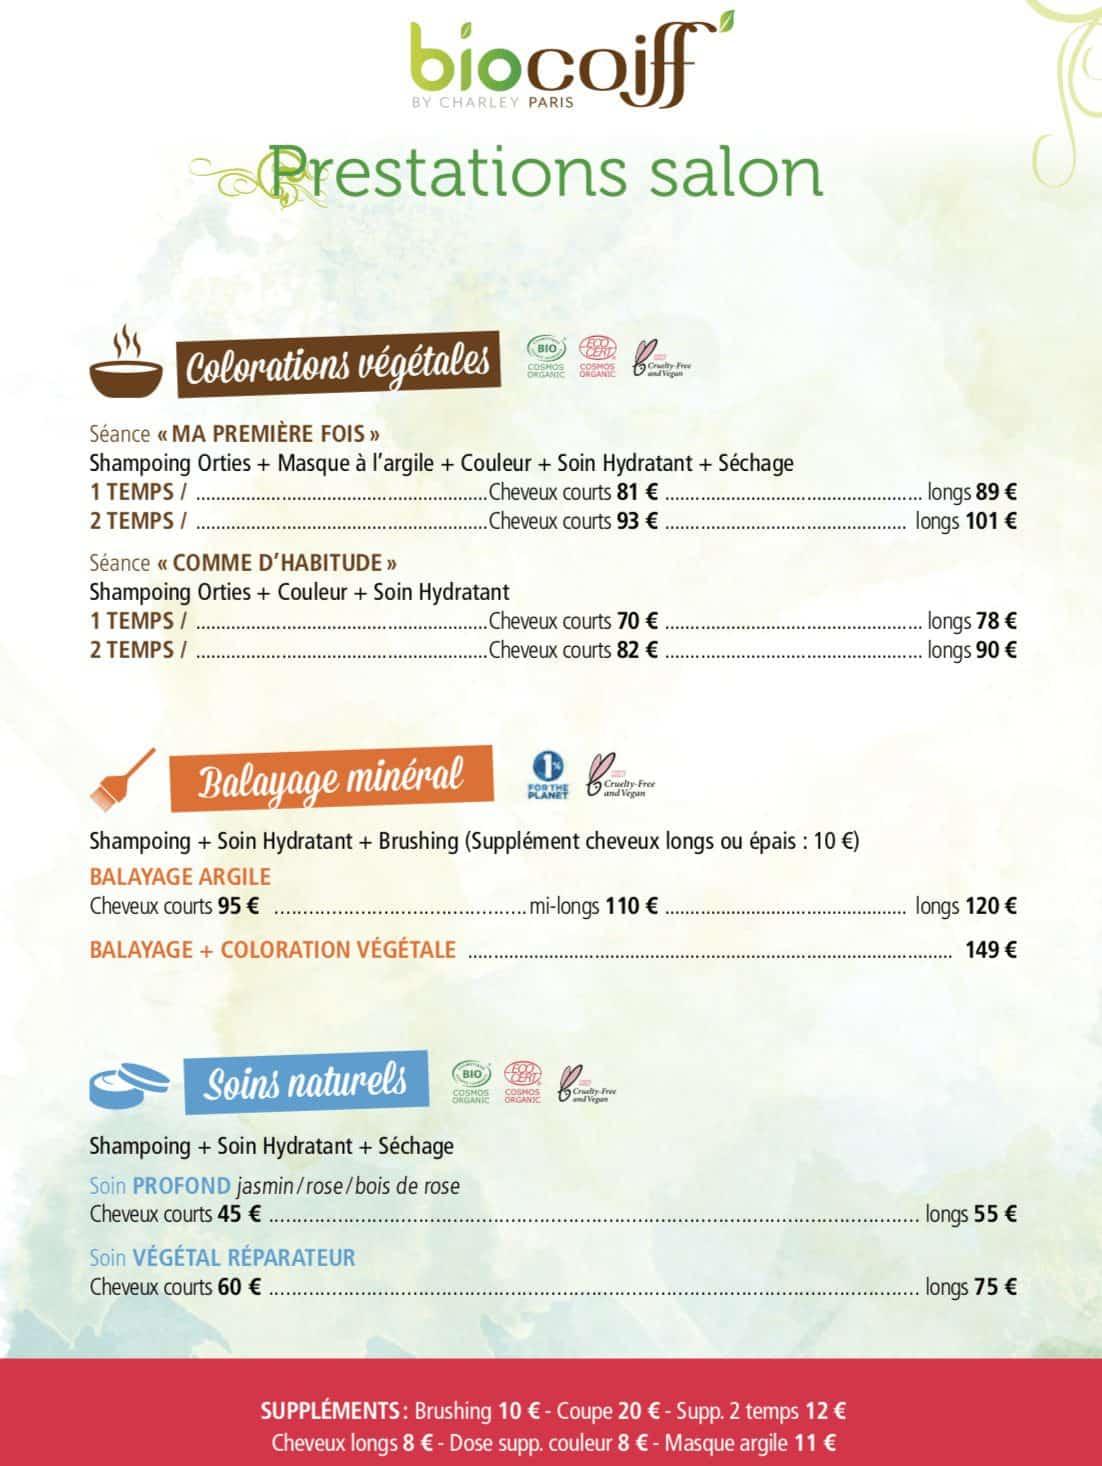 biocoiff frejus tarifs 1